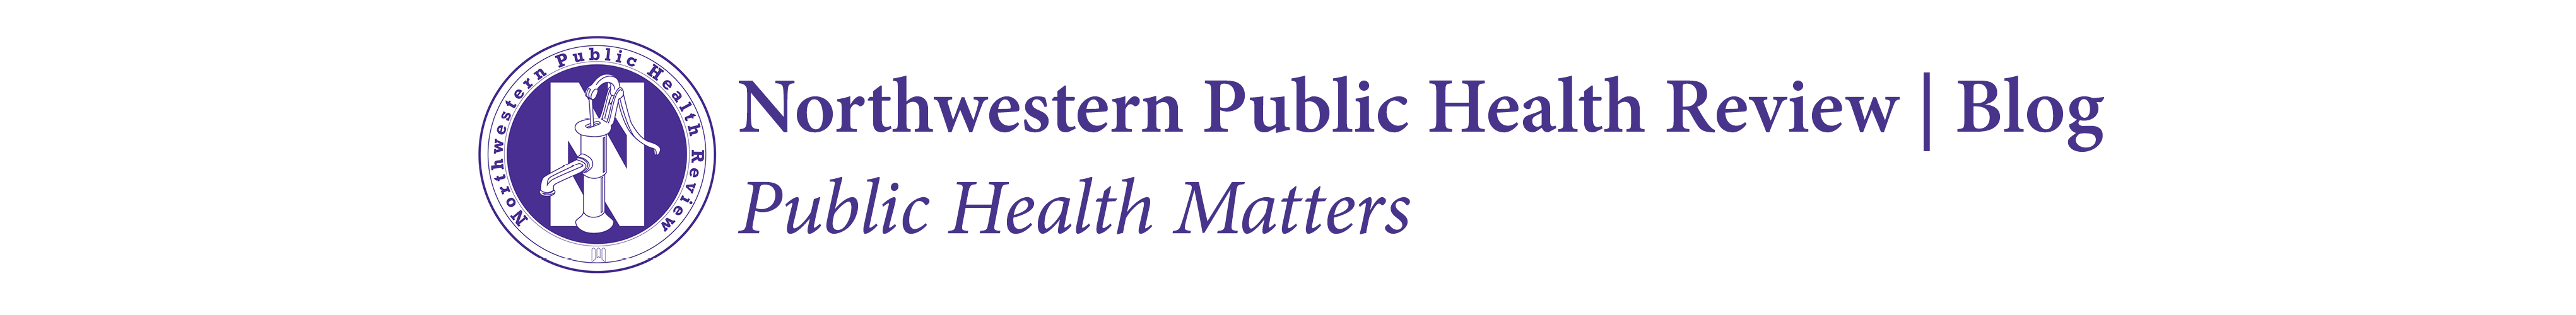 NPHR Blog